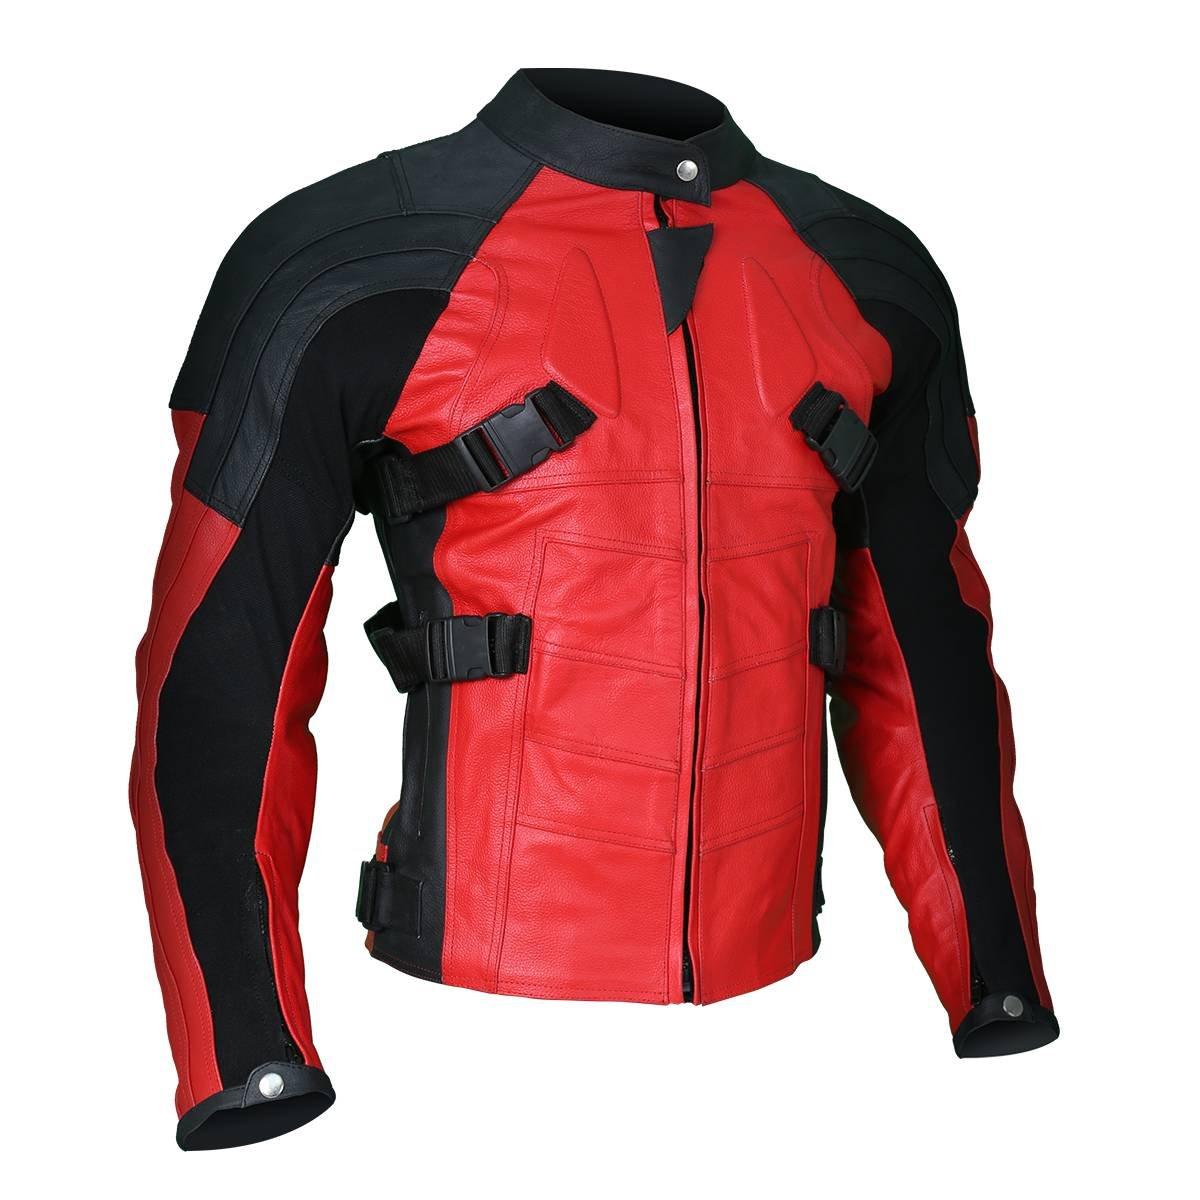 Men's Deadpool Wade Wilson Motorcycle Ryan Reynolds Biker Red Leather Jacket (XX-Small, Non-Armored)